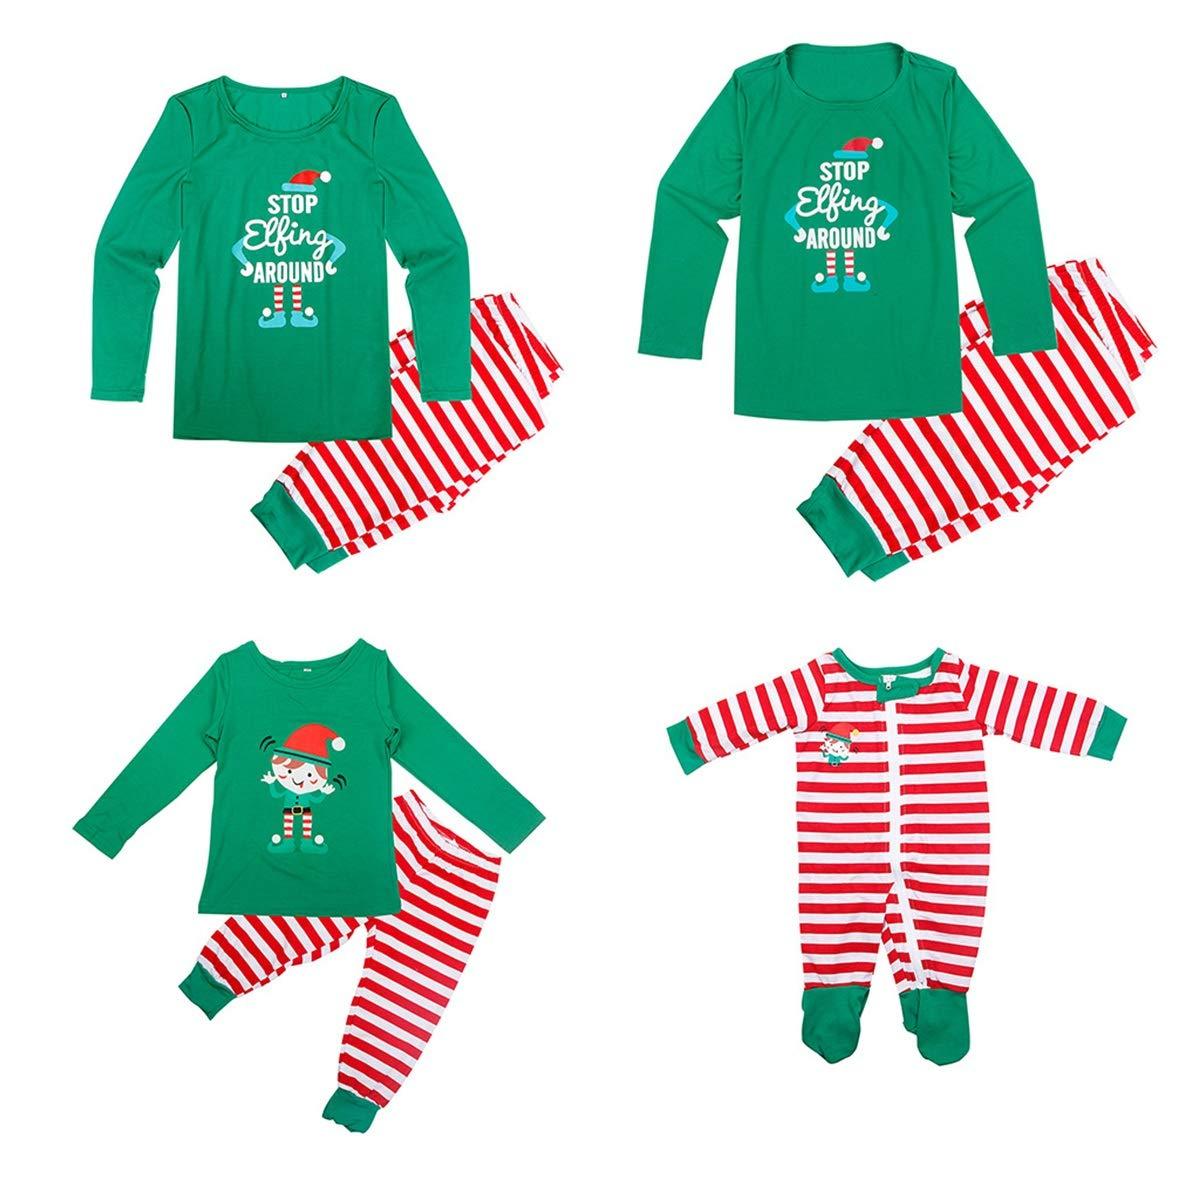 Dad Mom Baby Kid Family Matching Christmas Pajamas Sleepwear Homewear Set (XL, Dad) by Camidy